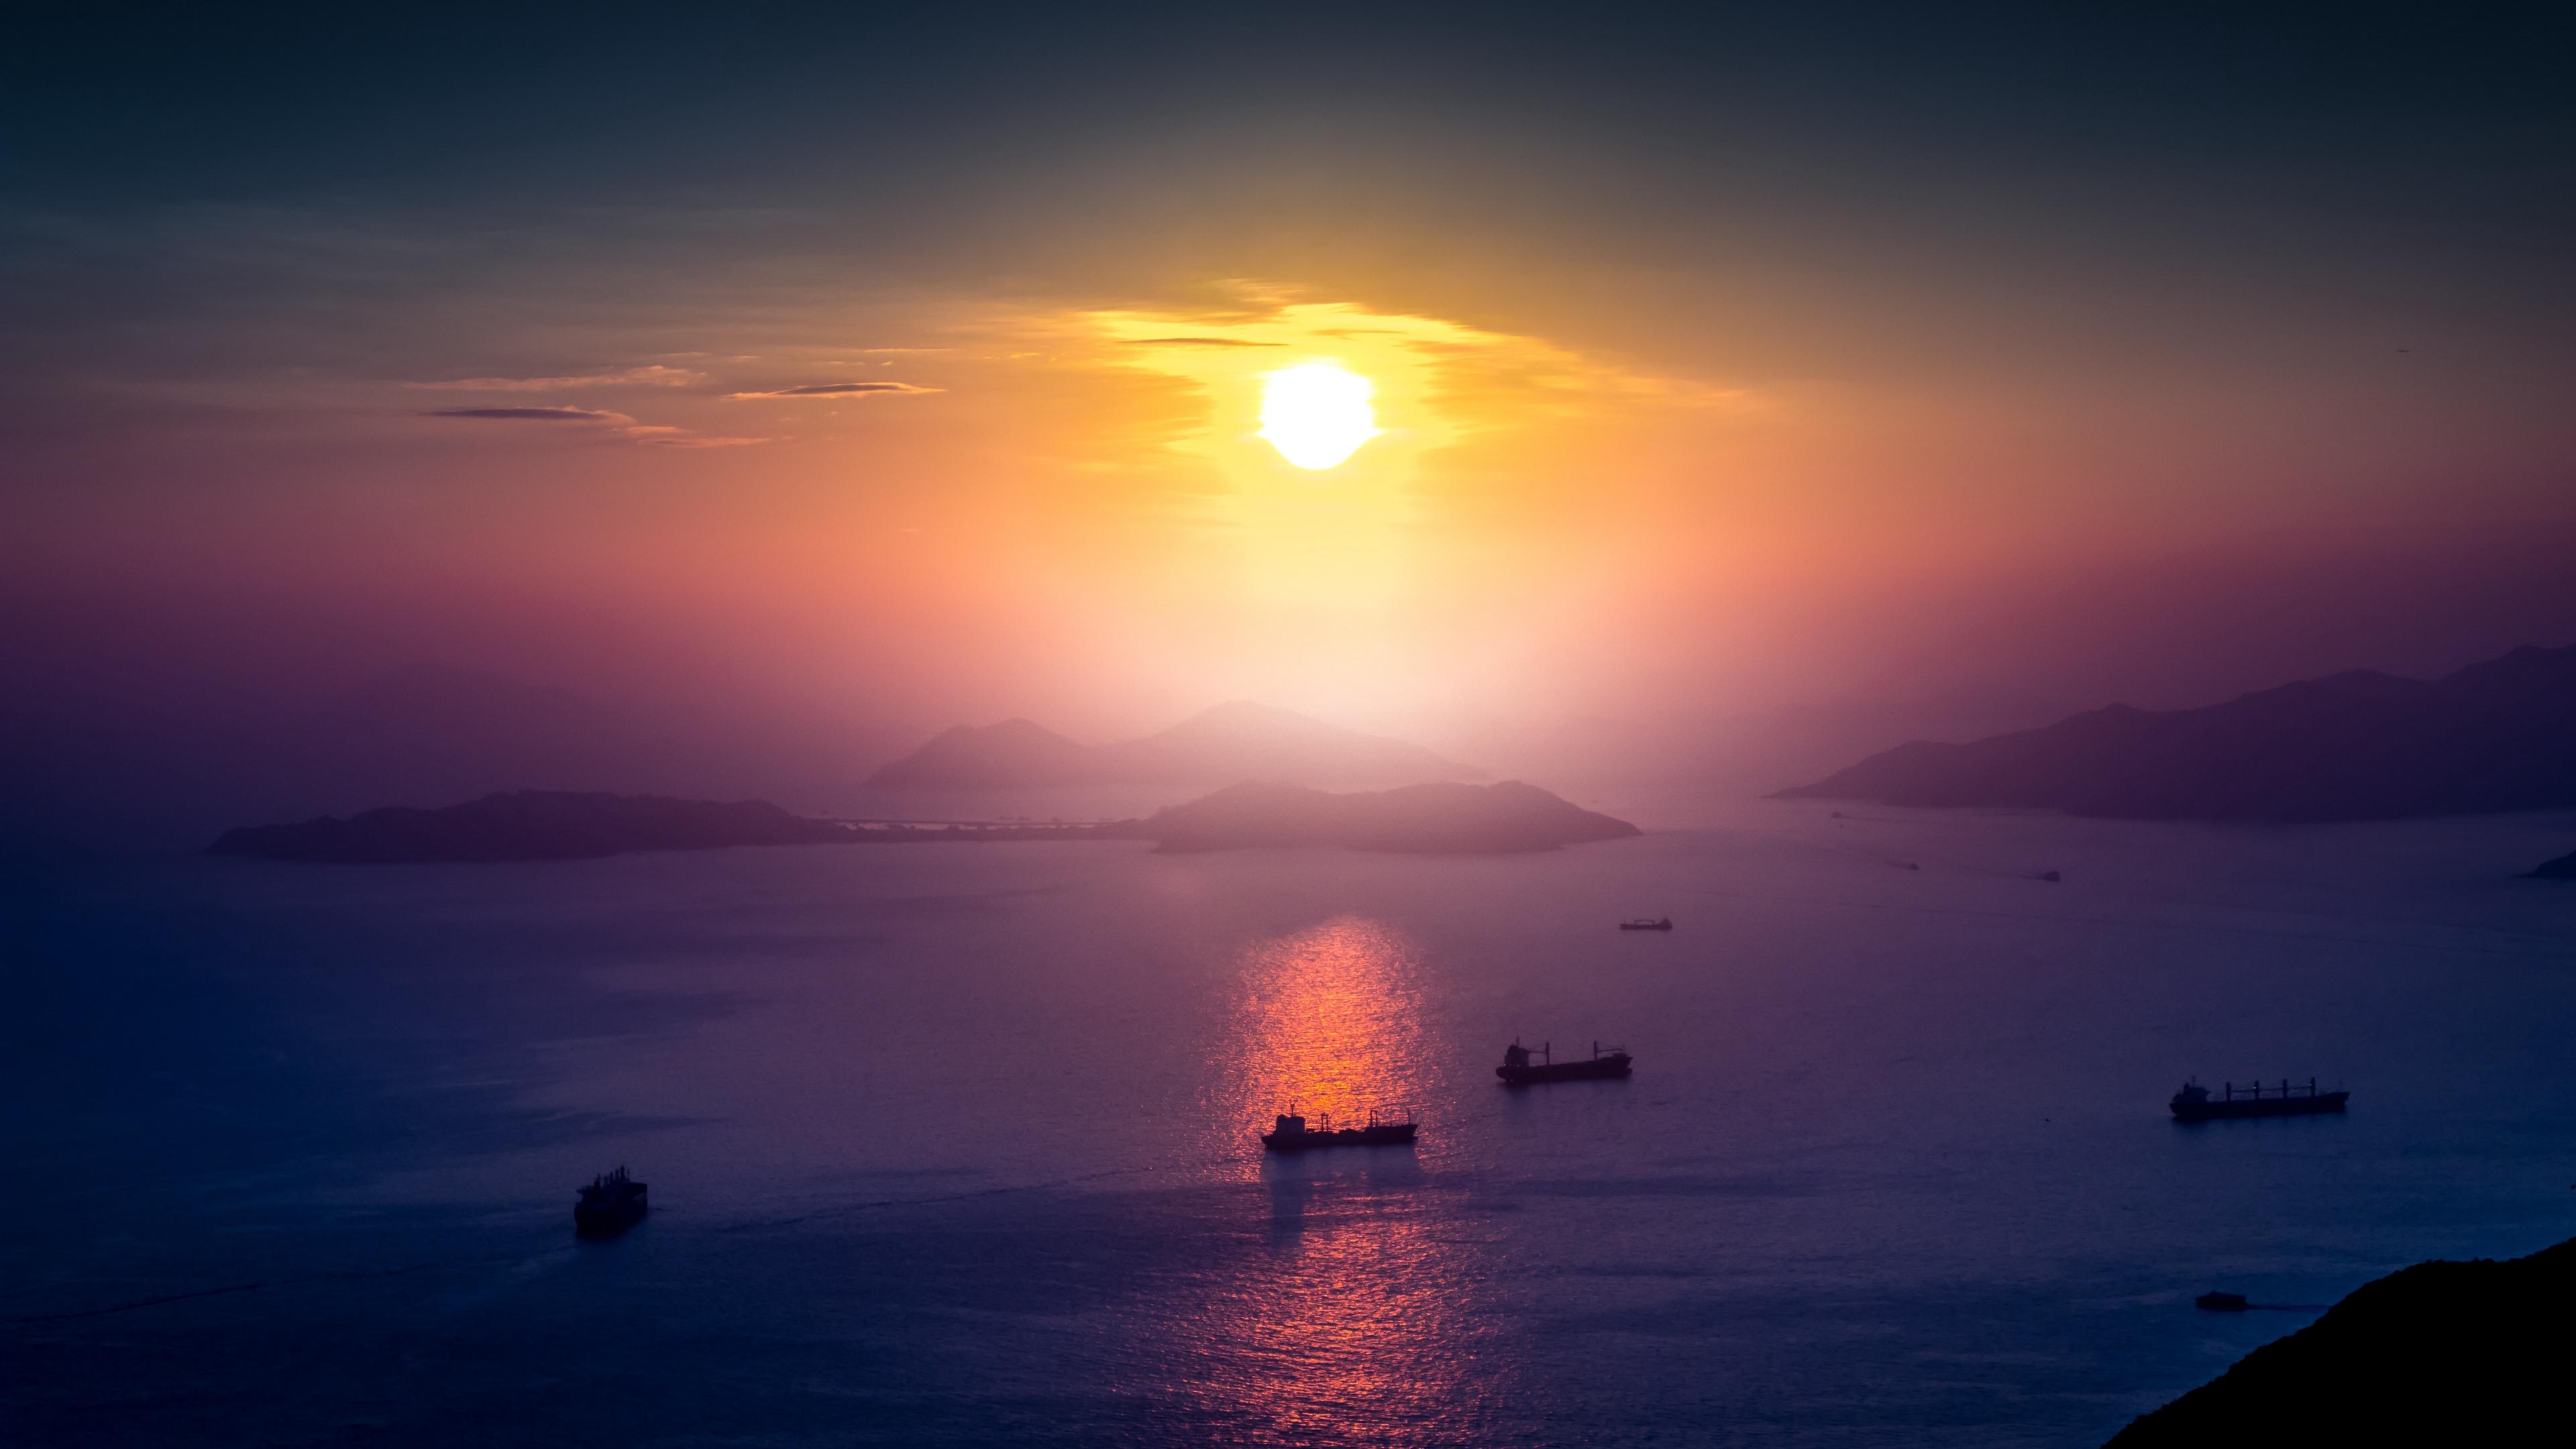 sea sunset boat dock horizon 4k 1541113519 - sea, sunset, boat, dock, horizon 4k - sunset, Sea, Boat